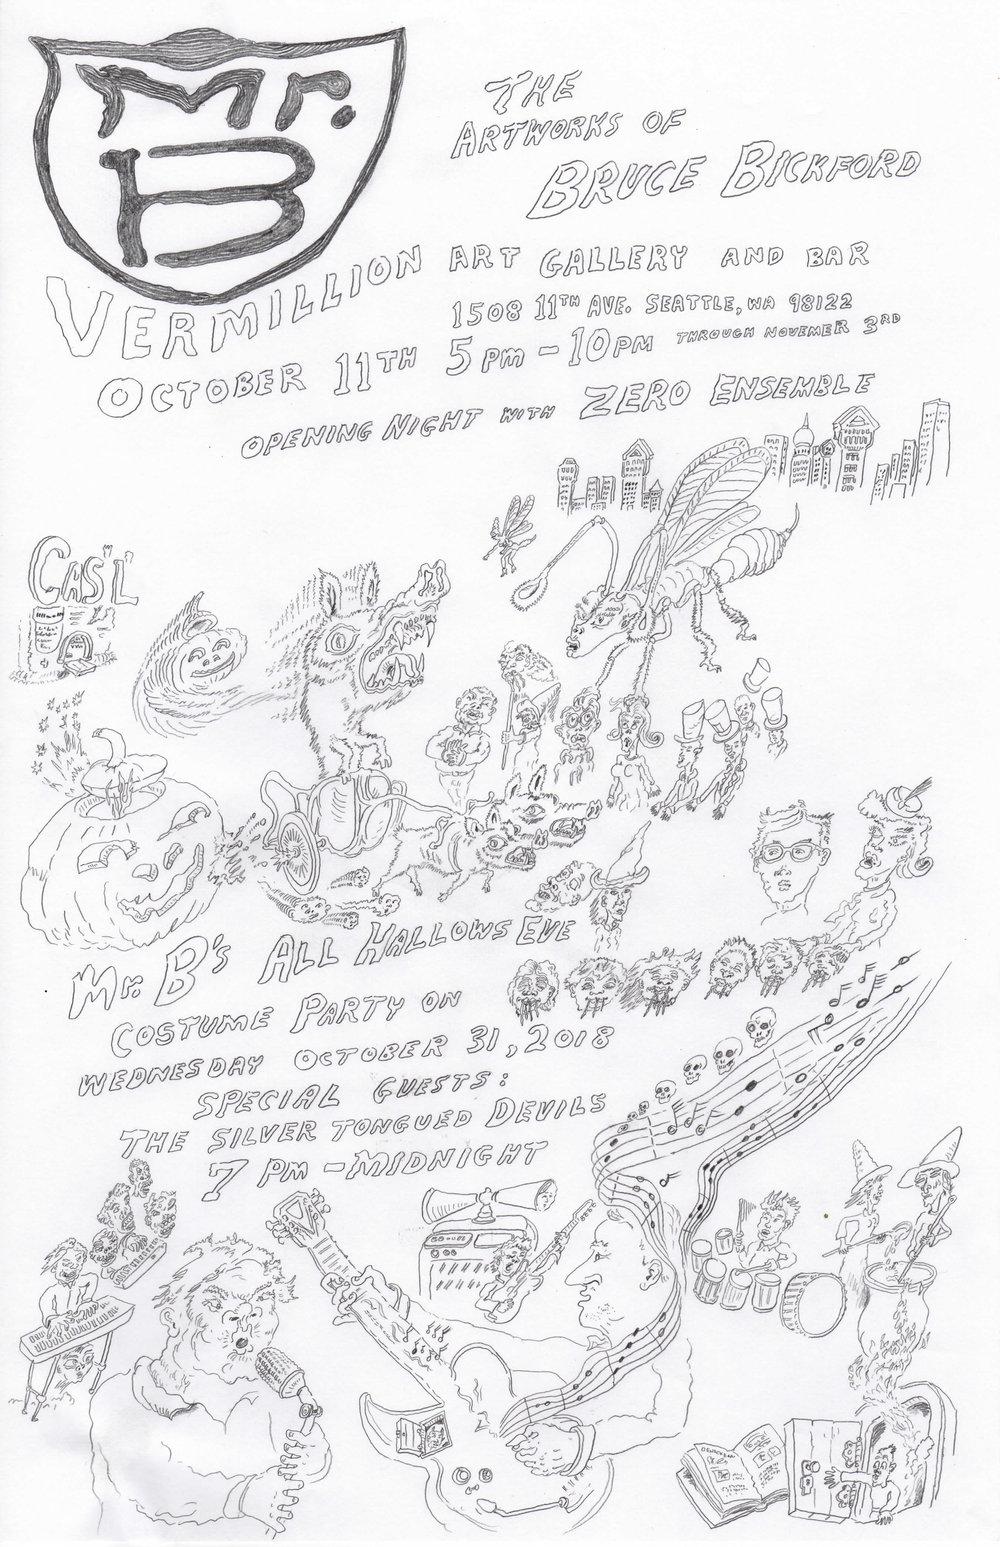 Bruce show Vermillion 10 2018 jpeg.jpg